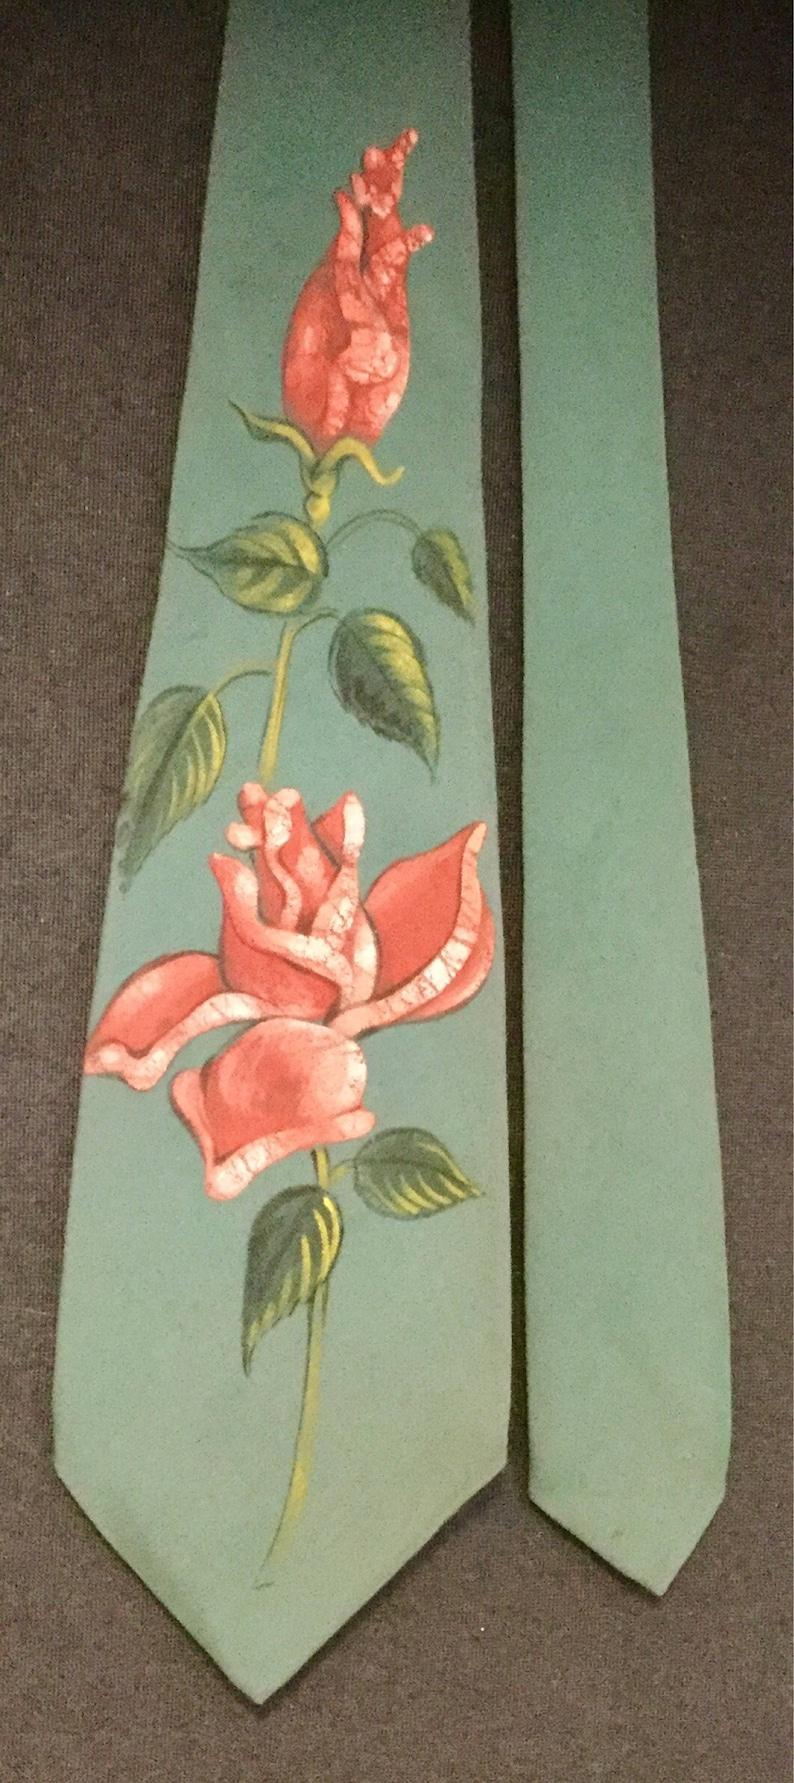 1940s Tie Necktie Hand-Painted Floral Print Rose Flower RedPinkBlueTealGreen Mens Unisex Vintage 1950s